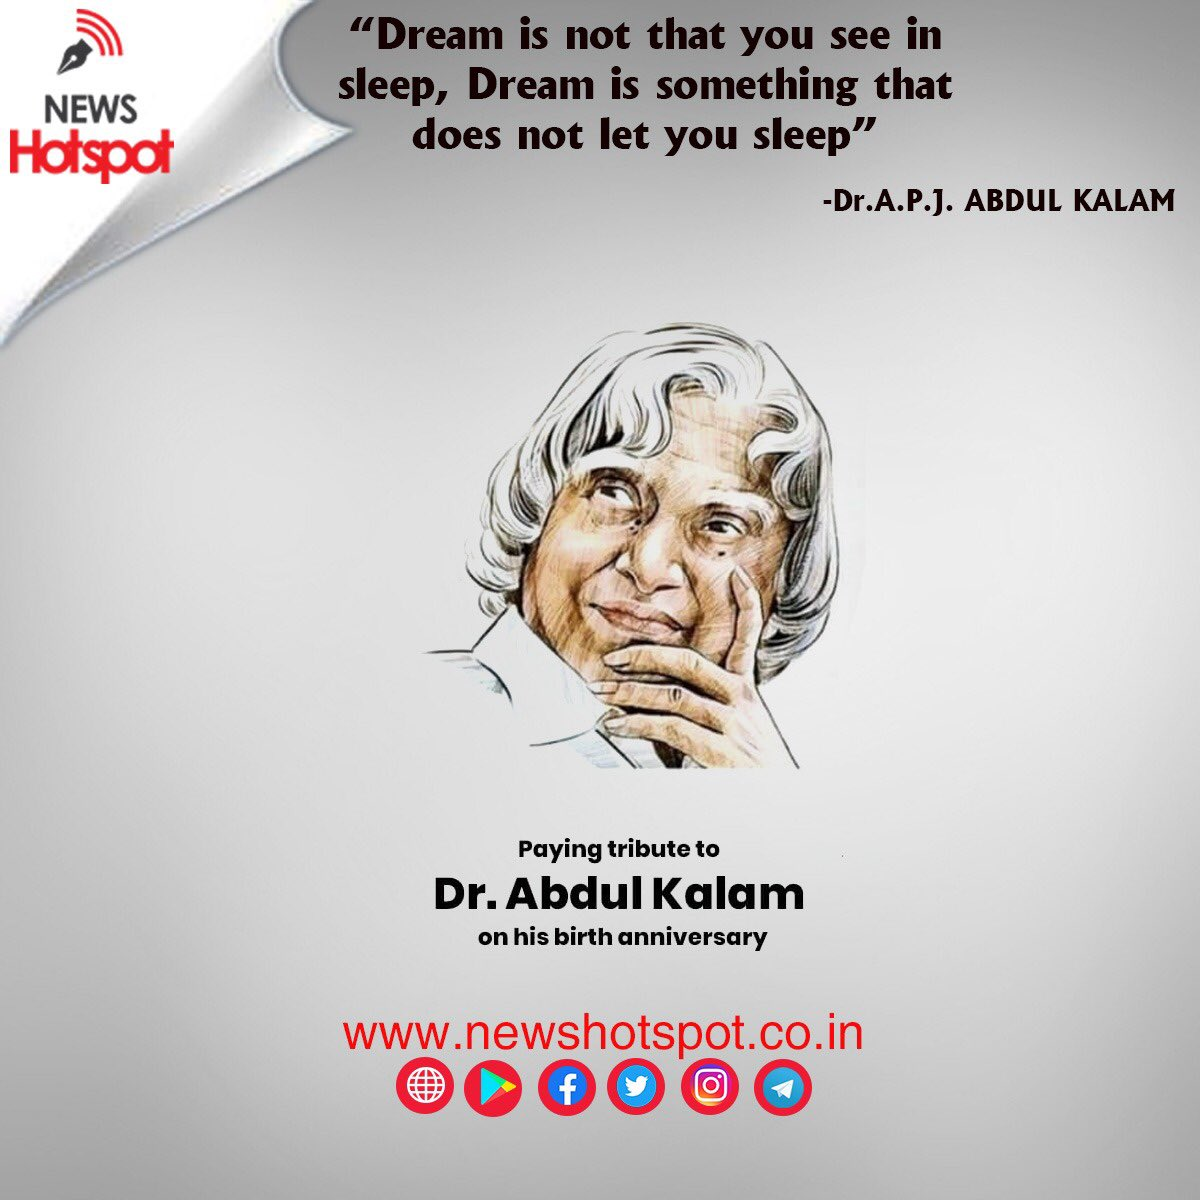 #DrKalam #Kalam #Abdulkalam #HappyBirthdayKalam #newhotspot #WorldPostDay